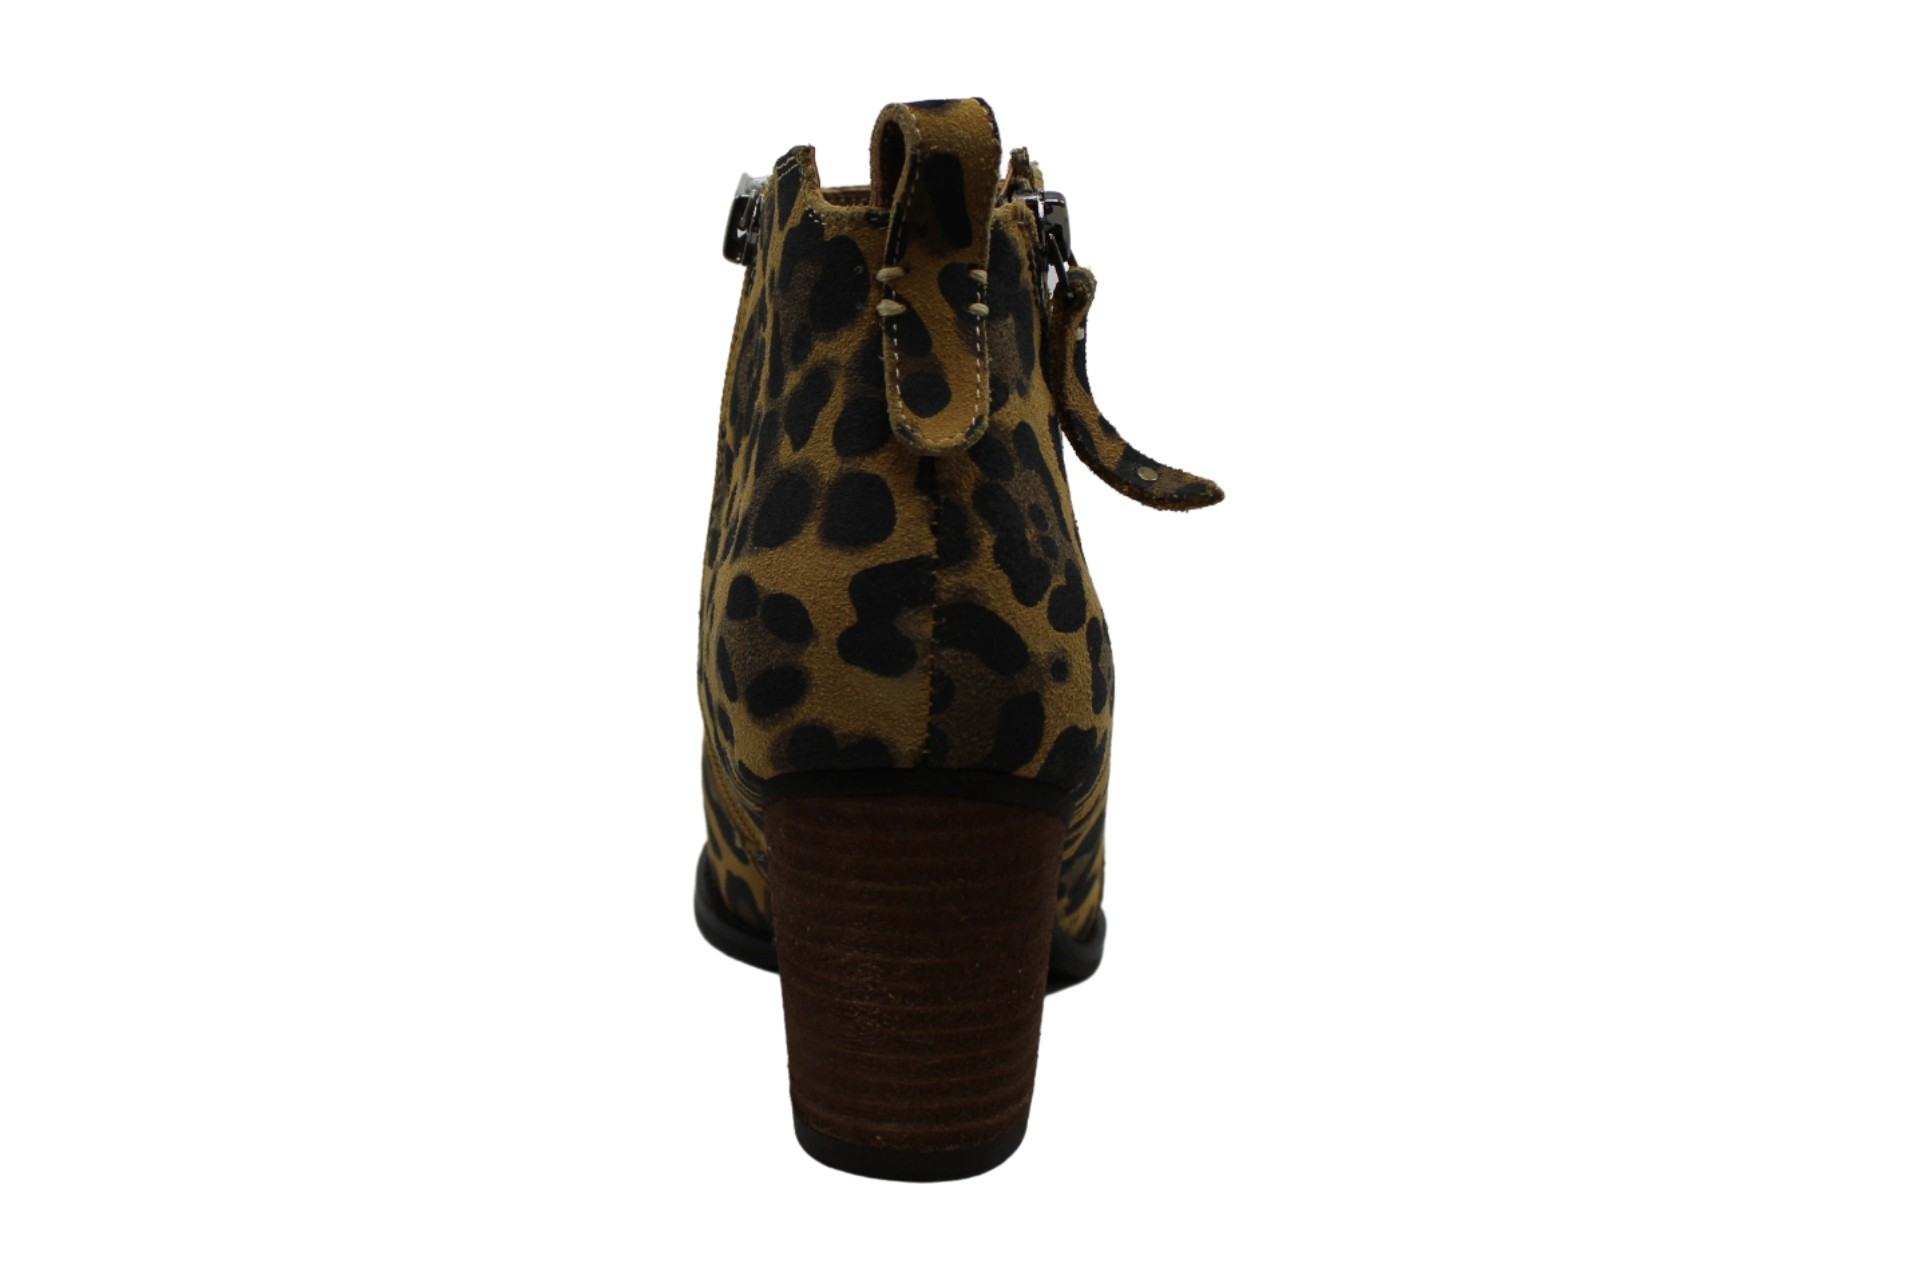 thumbnail 10 - Aqua-College-Womens-Nancy-Leather-Almond-Toe-Ankle-Fashion-Boots